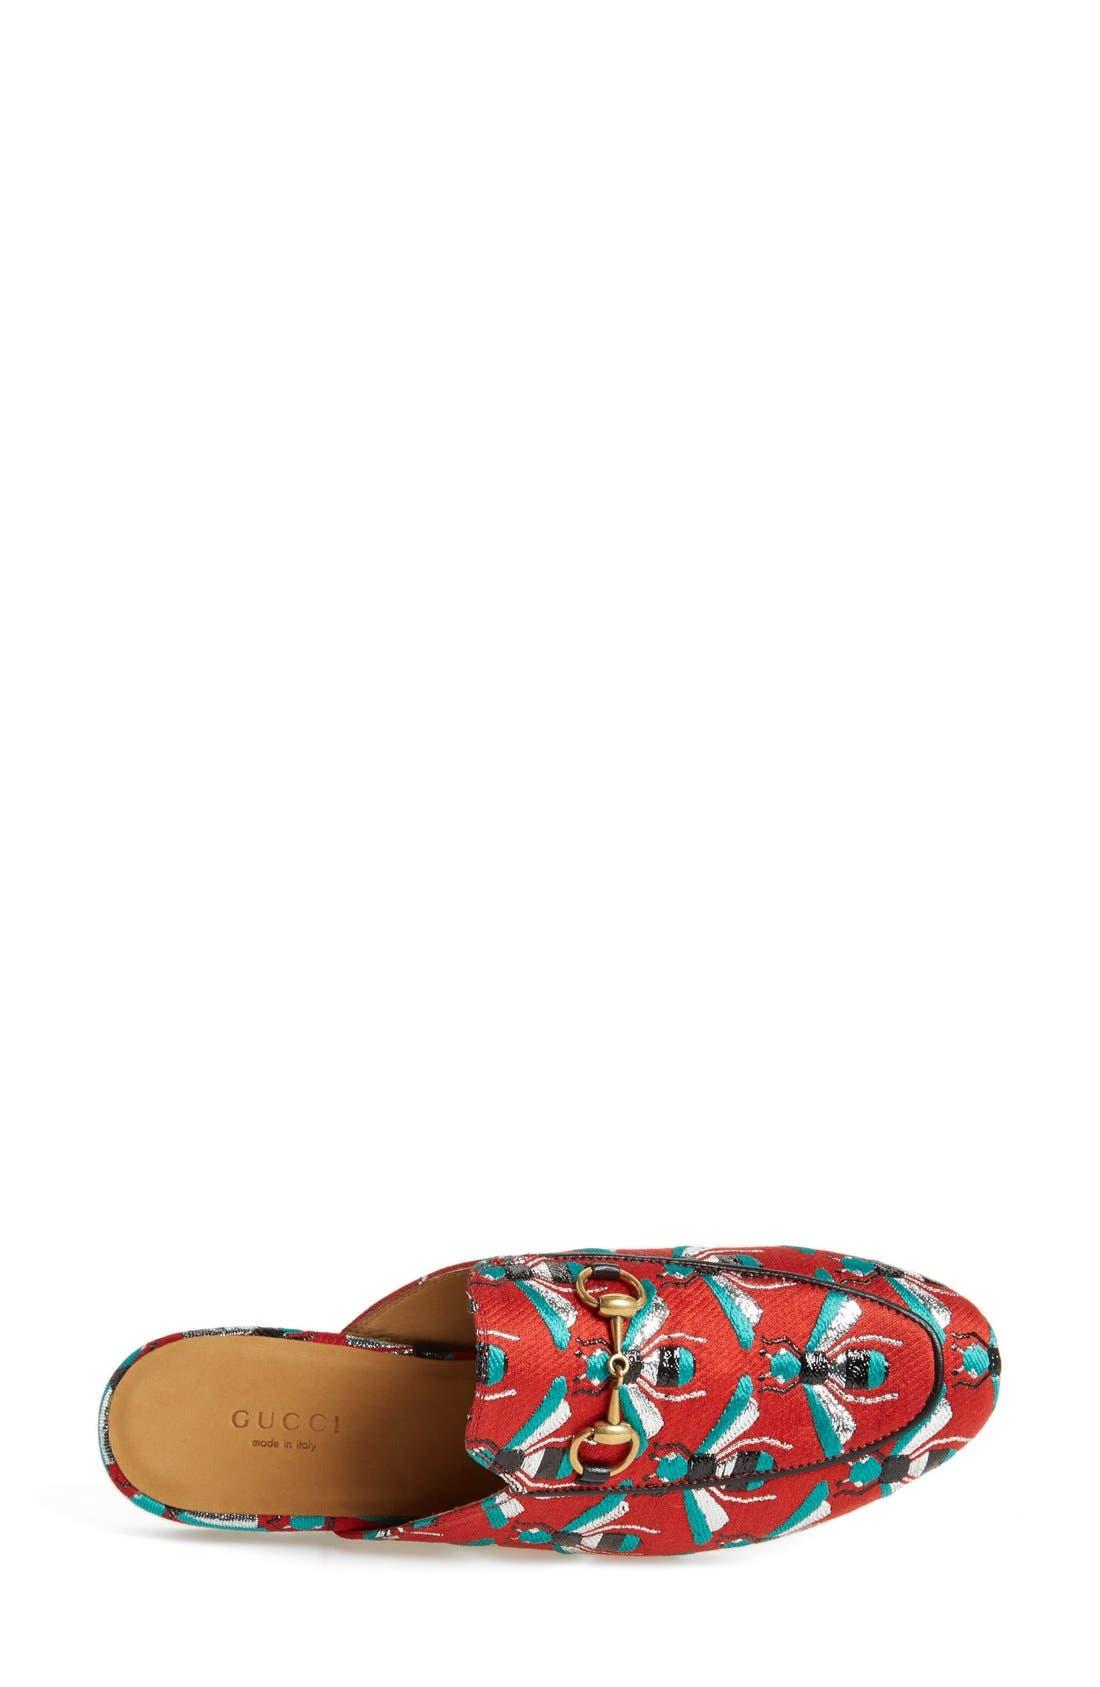 Alternate Image 3  - Gucci 'Princetown' Print Mule Loafer (Women)